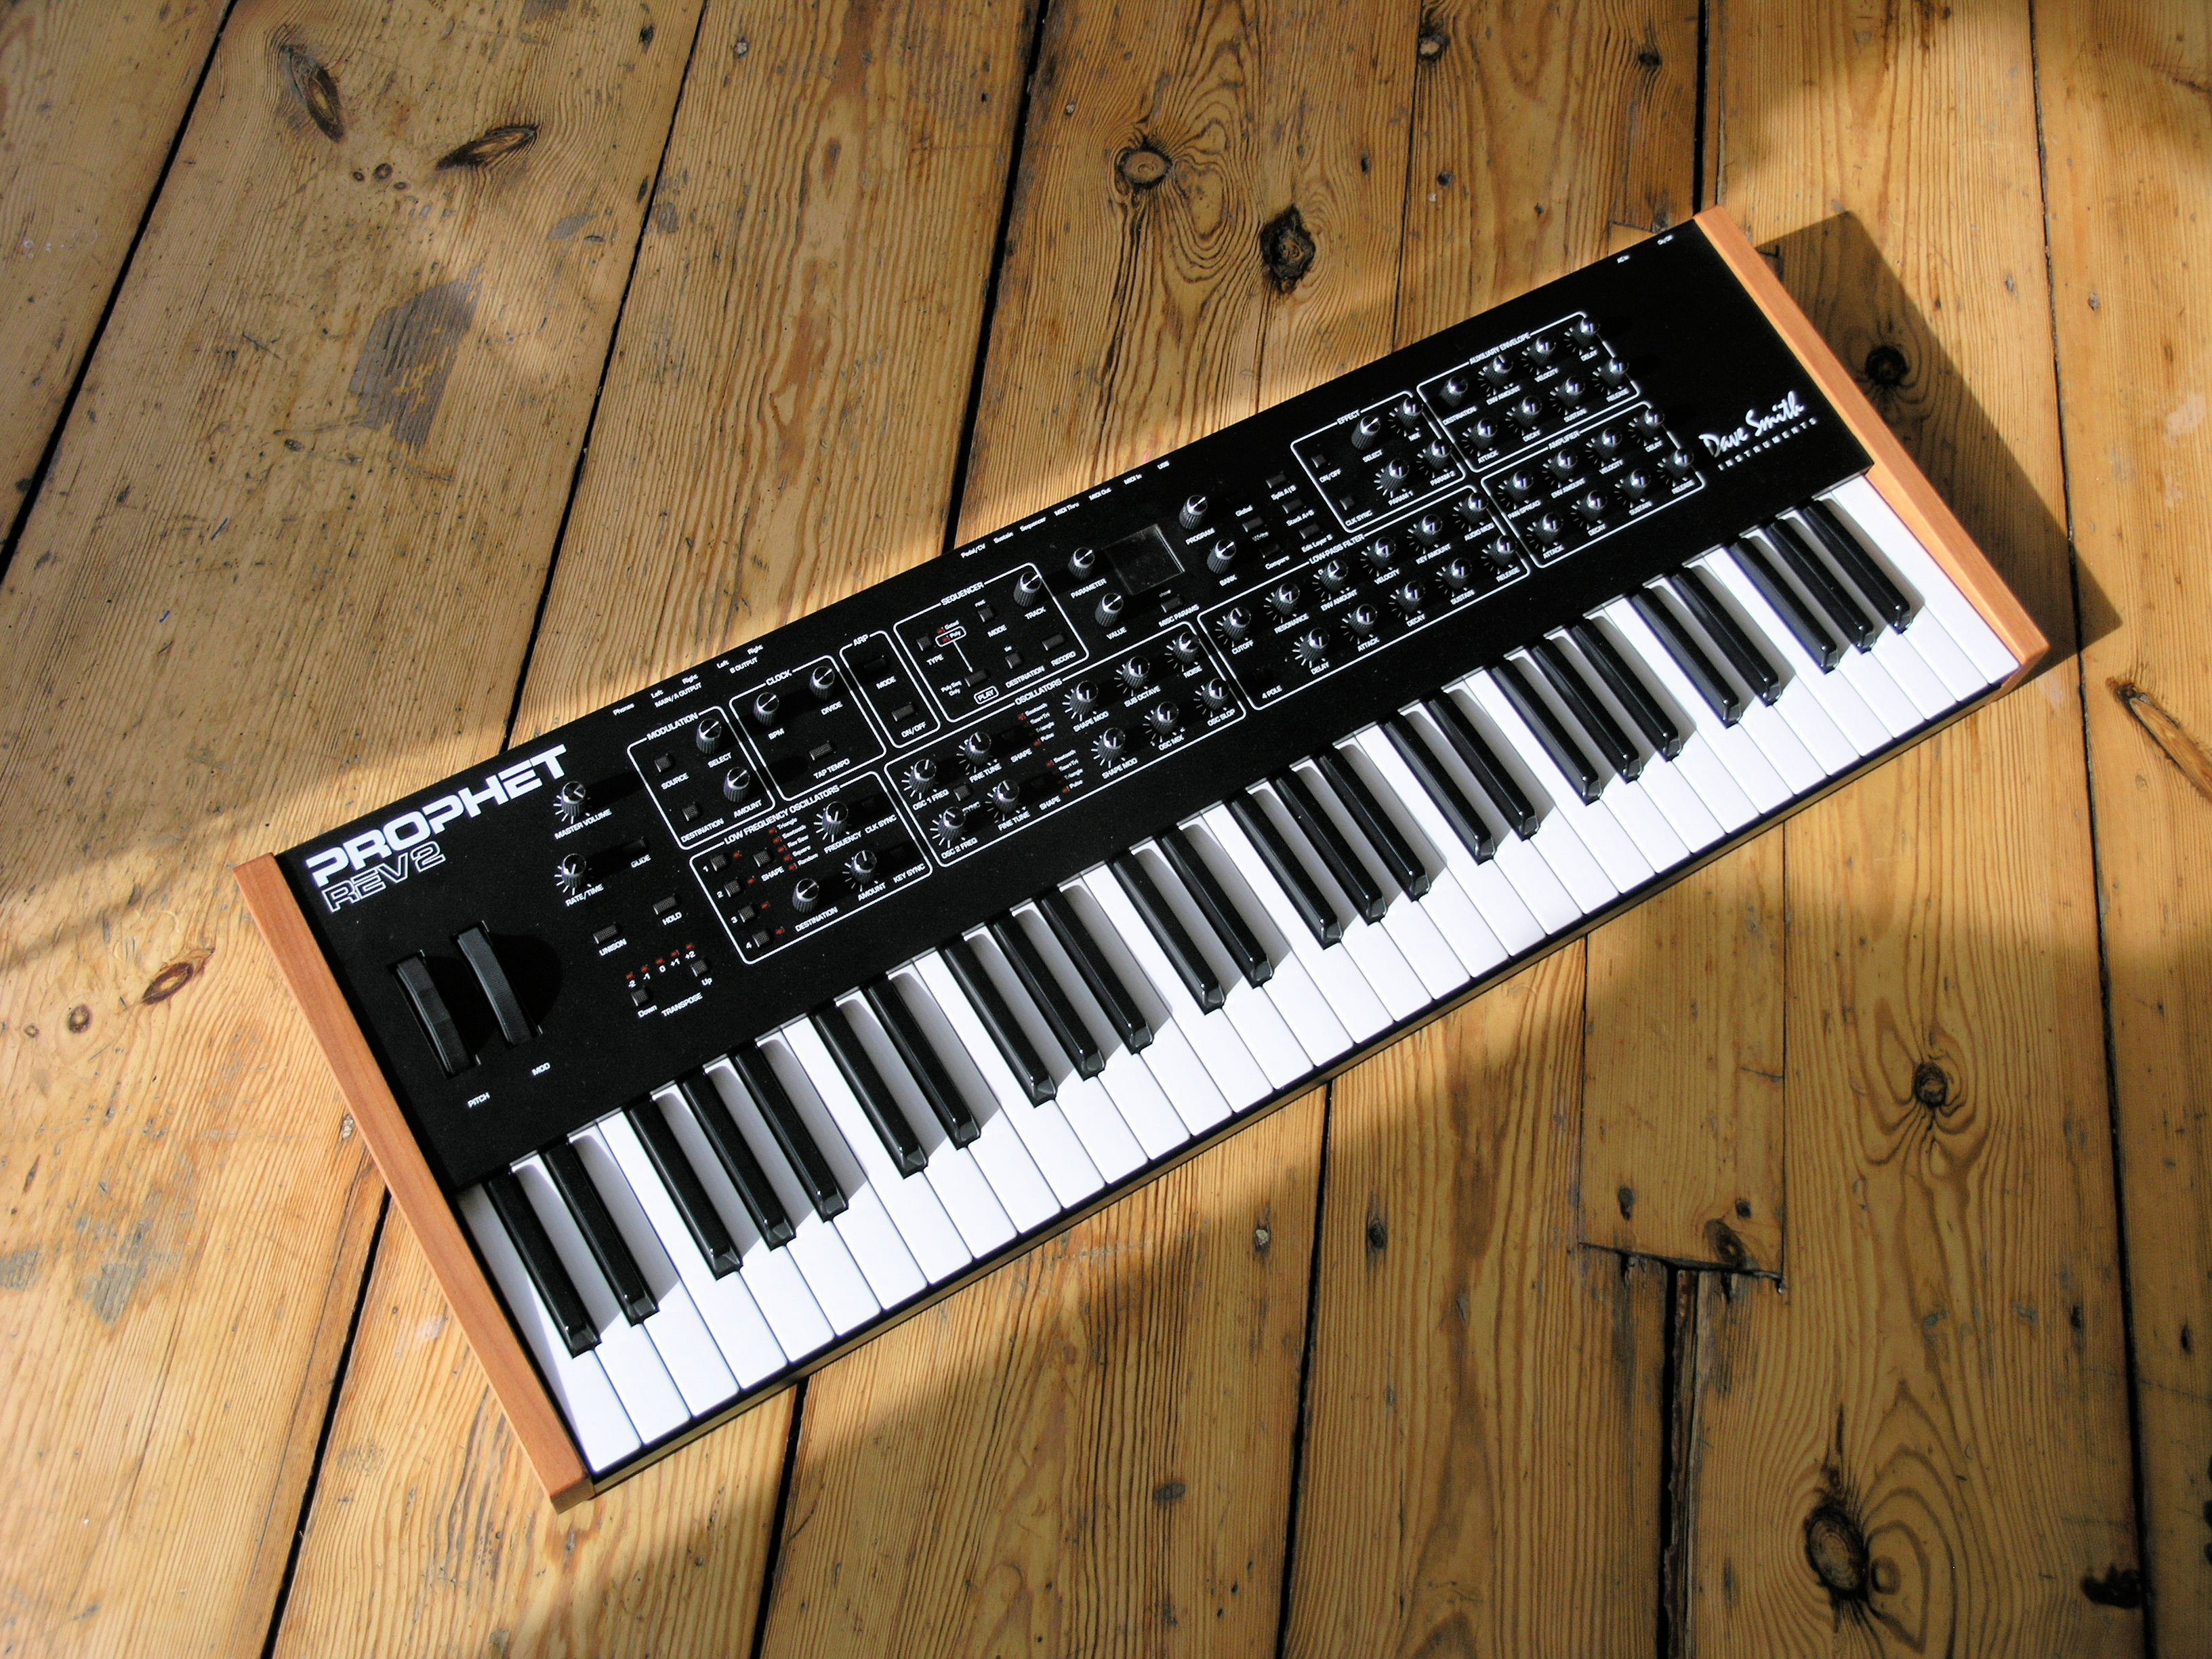 test dave smith instruments prophet rev2 synthesizer seite 7 von 7. Black Bedroom Furniture Sets. Home Design Ideas